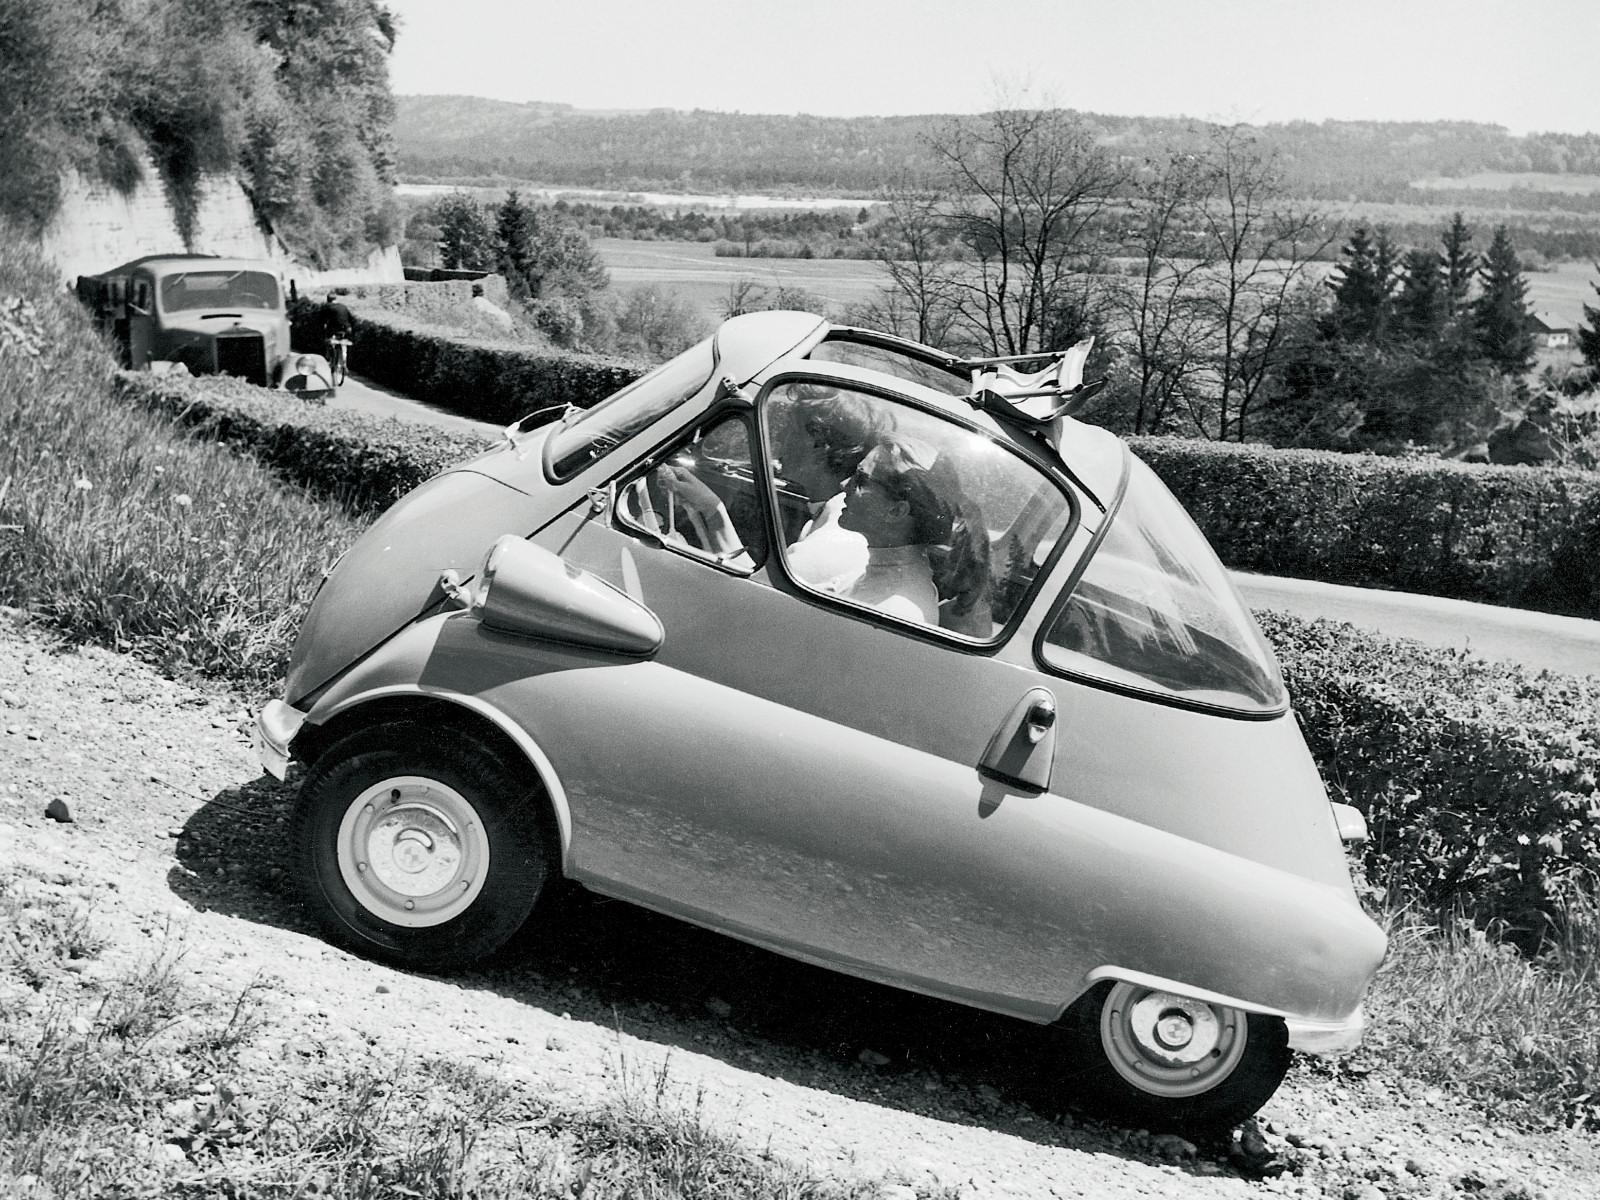 bmw_isetta-1955-1962_r8_jpg.jpg